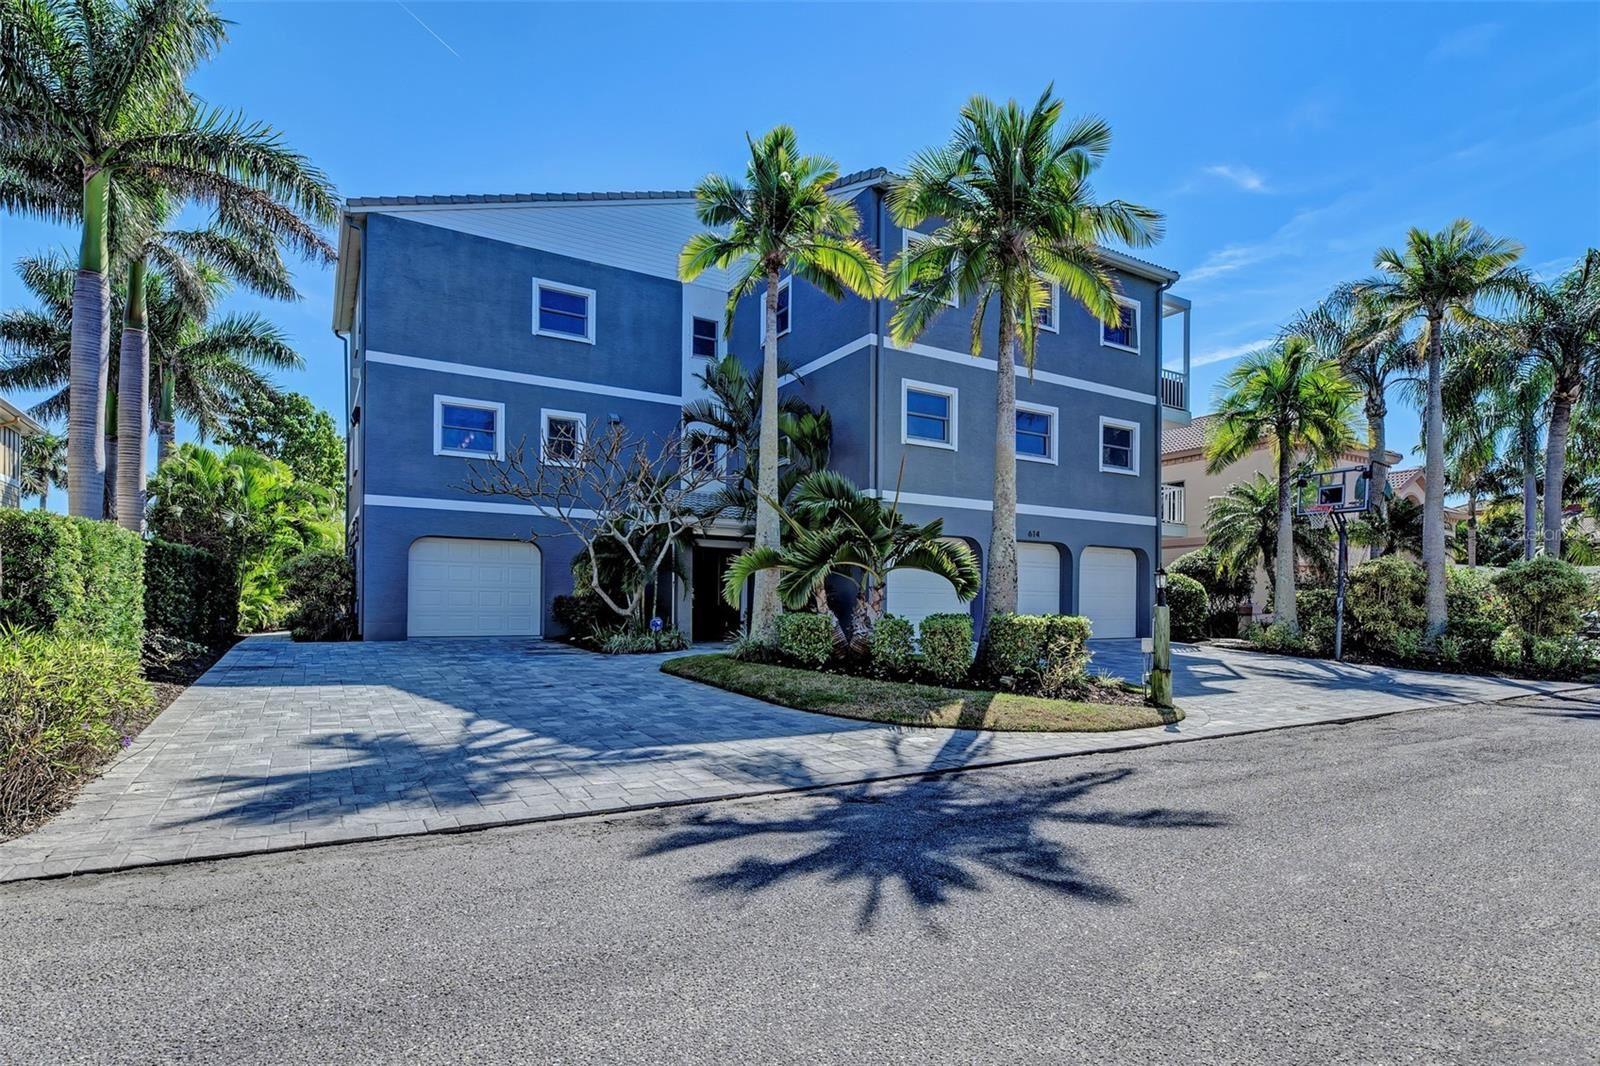 614 NORTON STREET, Longboat Key, FL 34228 - #: A4504183